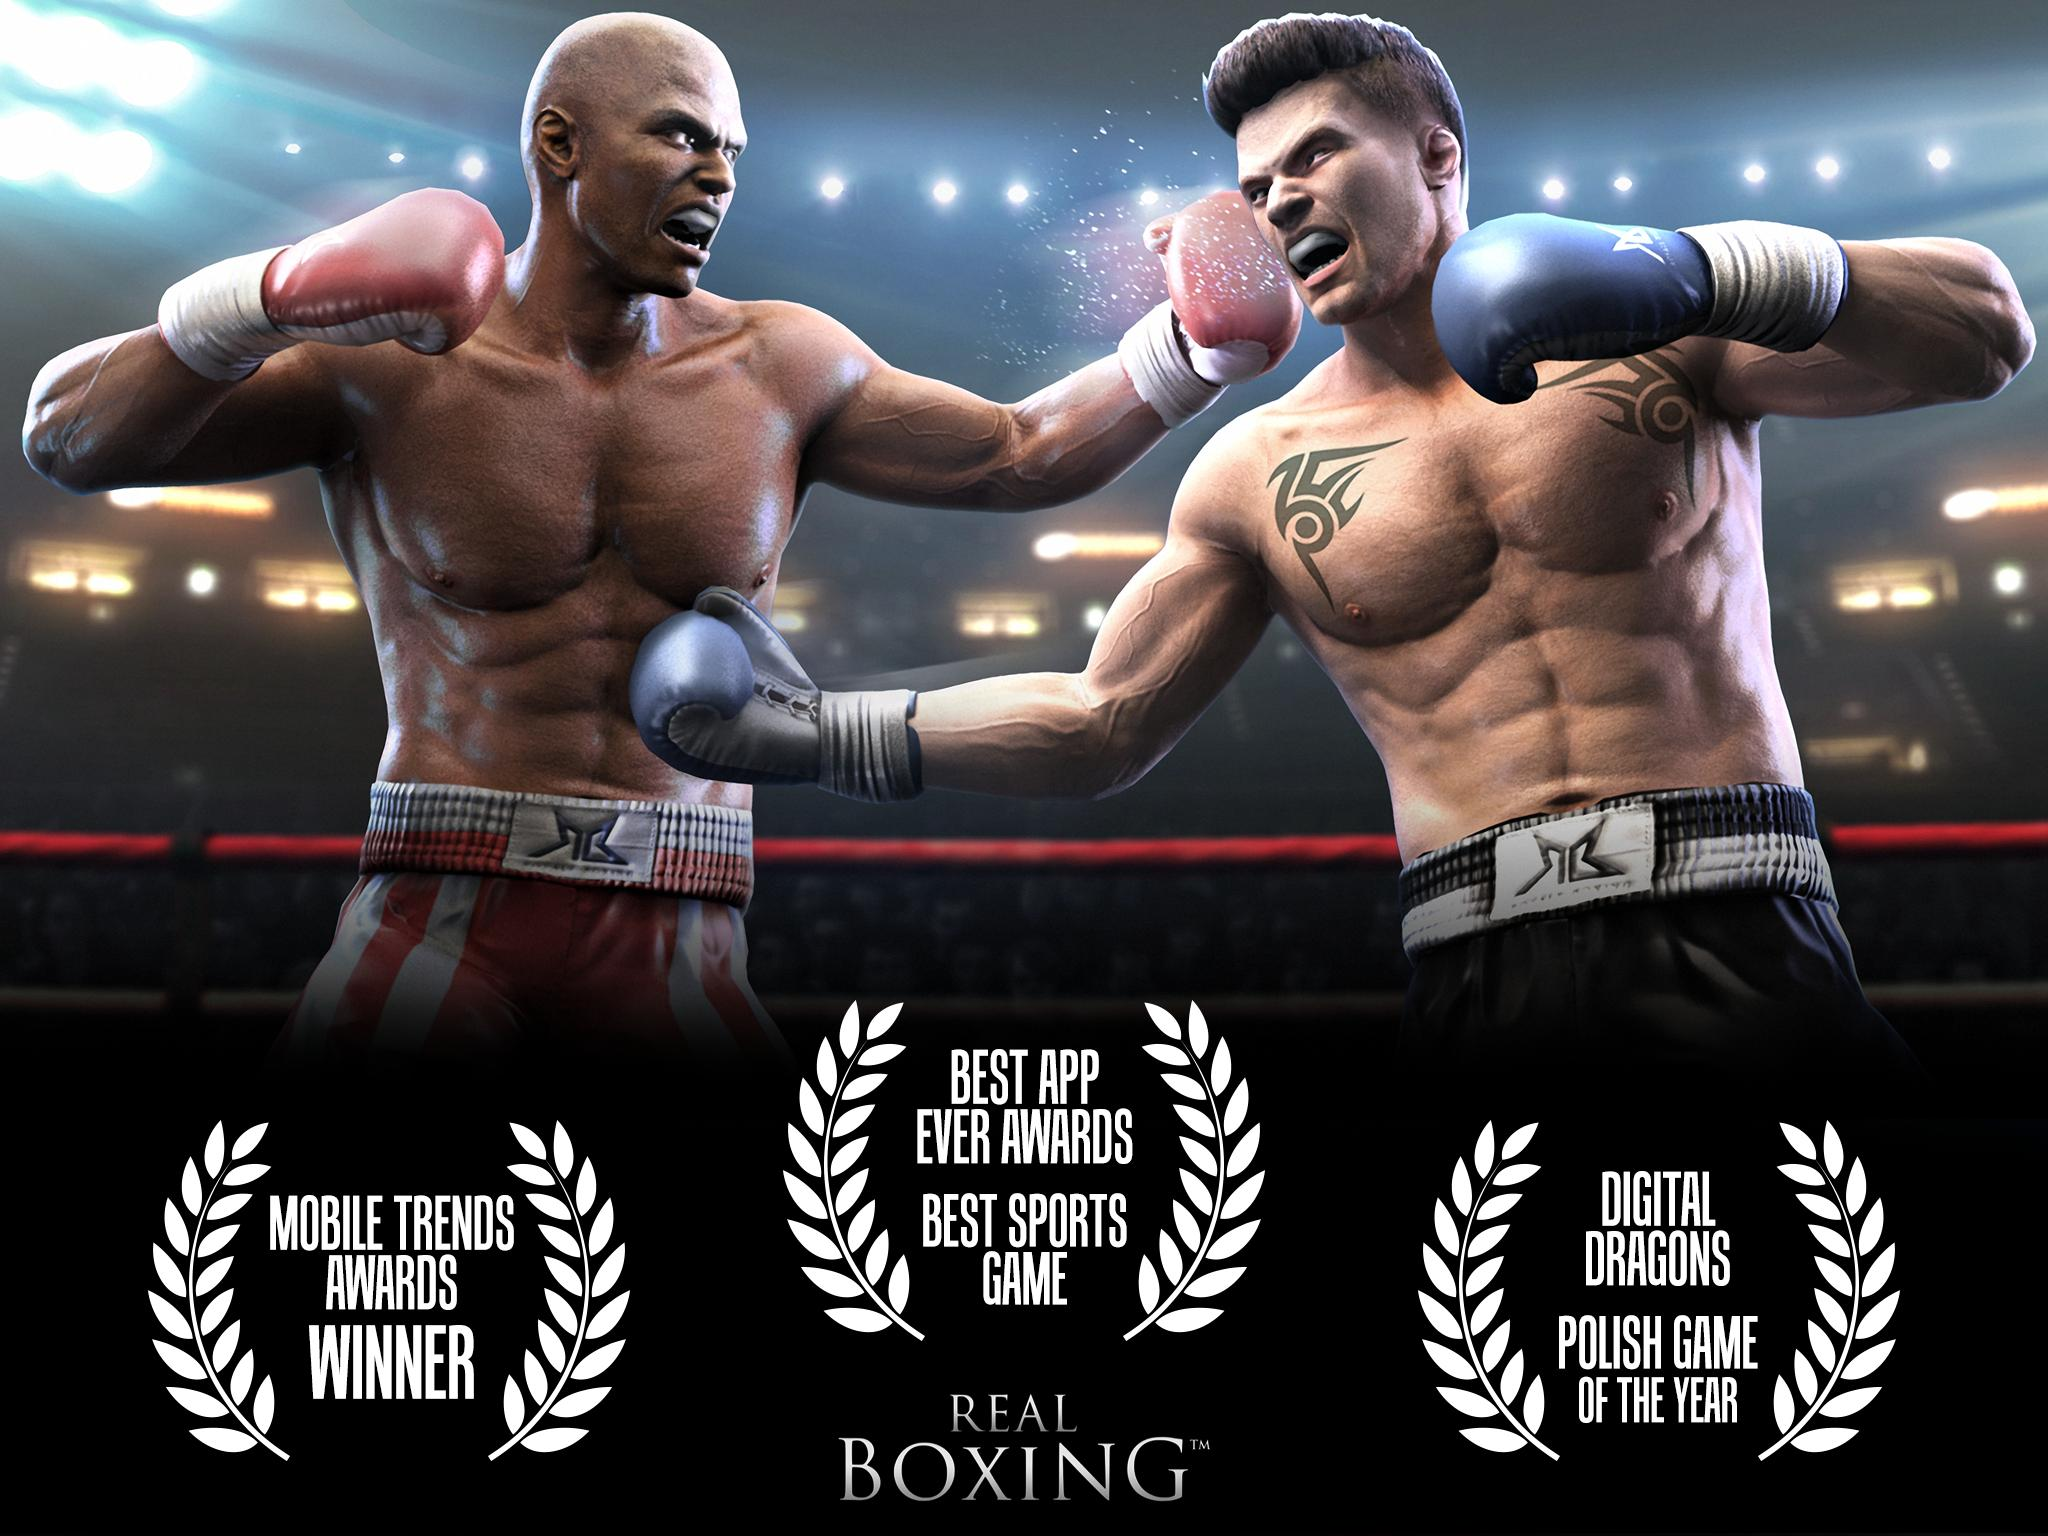 Real Boxing –Fighting Game 2.6.1 Screenshot 8